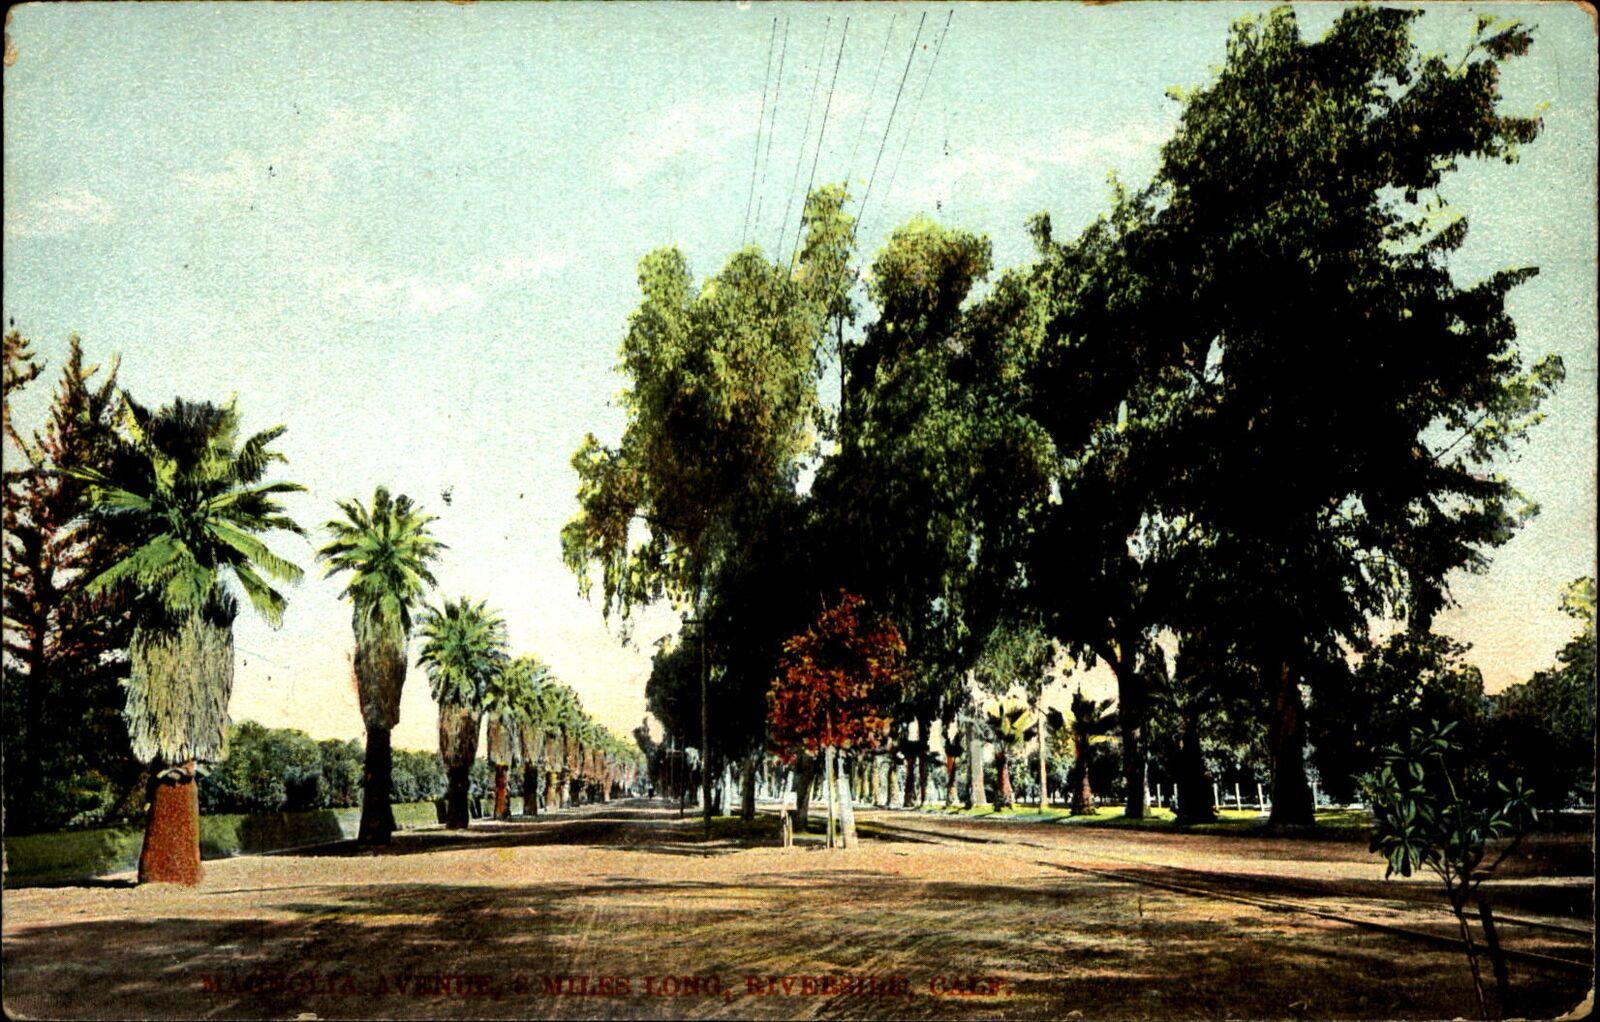 Magnolia avenue c 1900 riverside california street